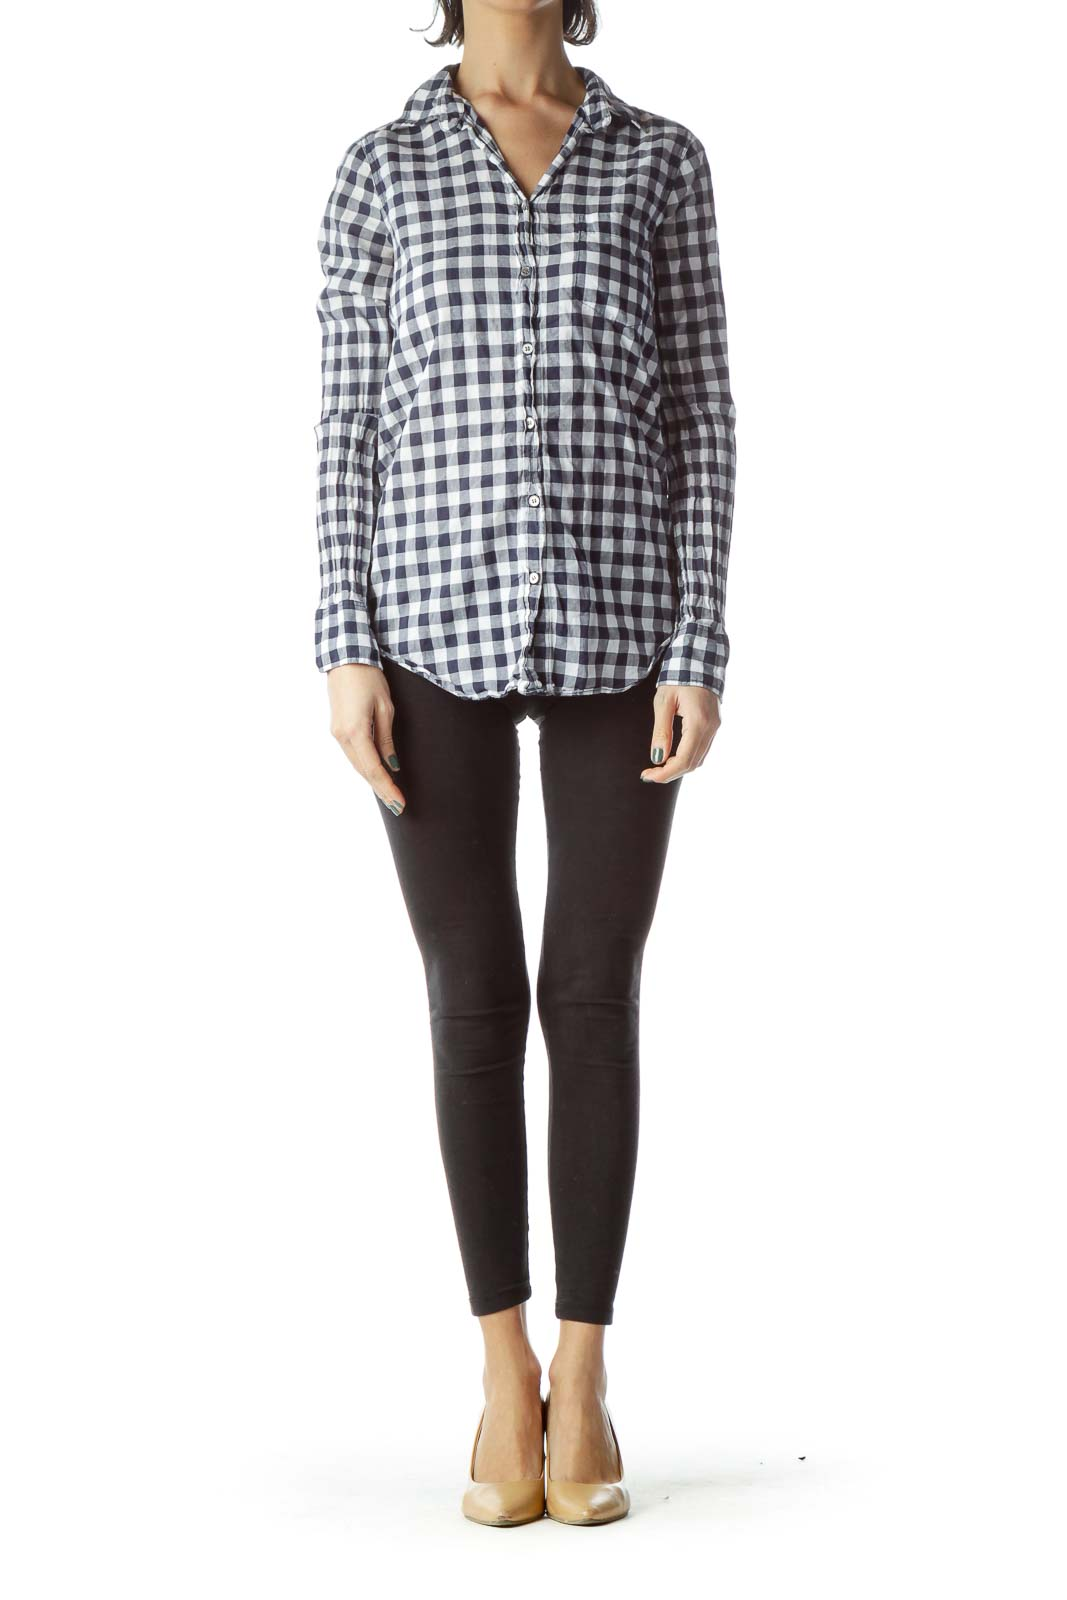 Navy Blue White Checkered 100% Cotton Long Shirt